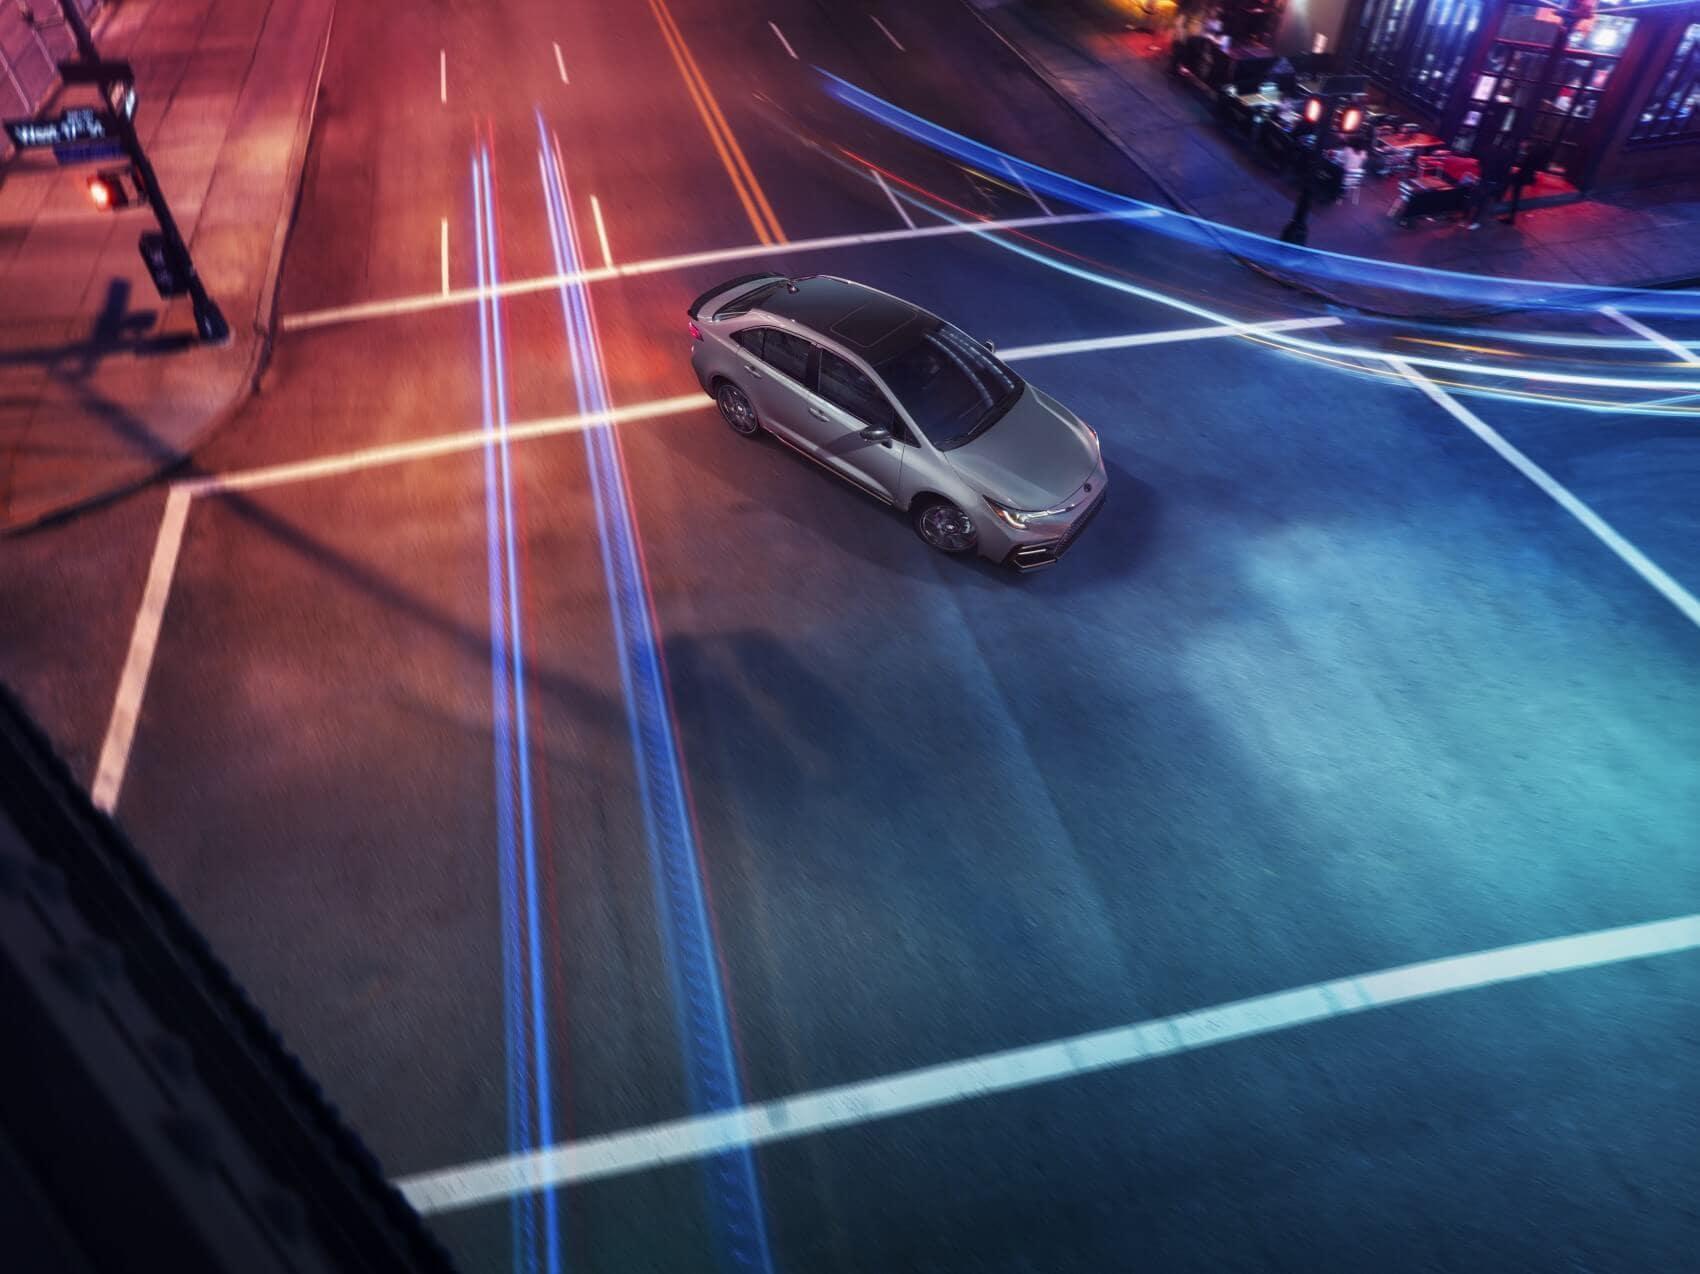 Toyota Corolla vs Hyundai Elantra Safety